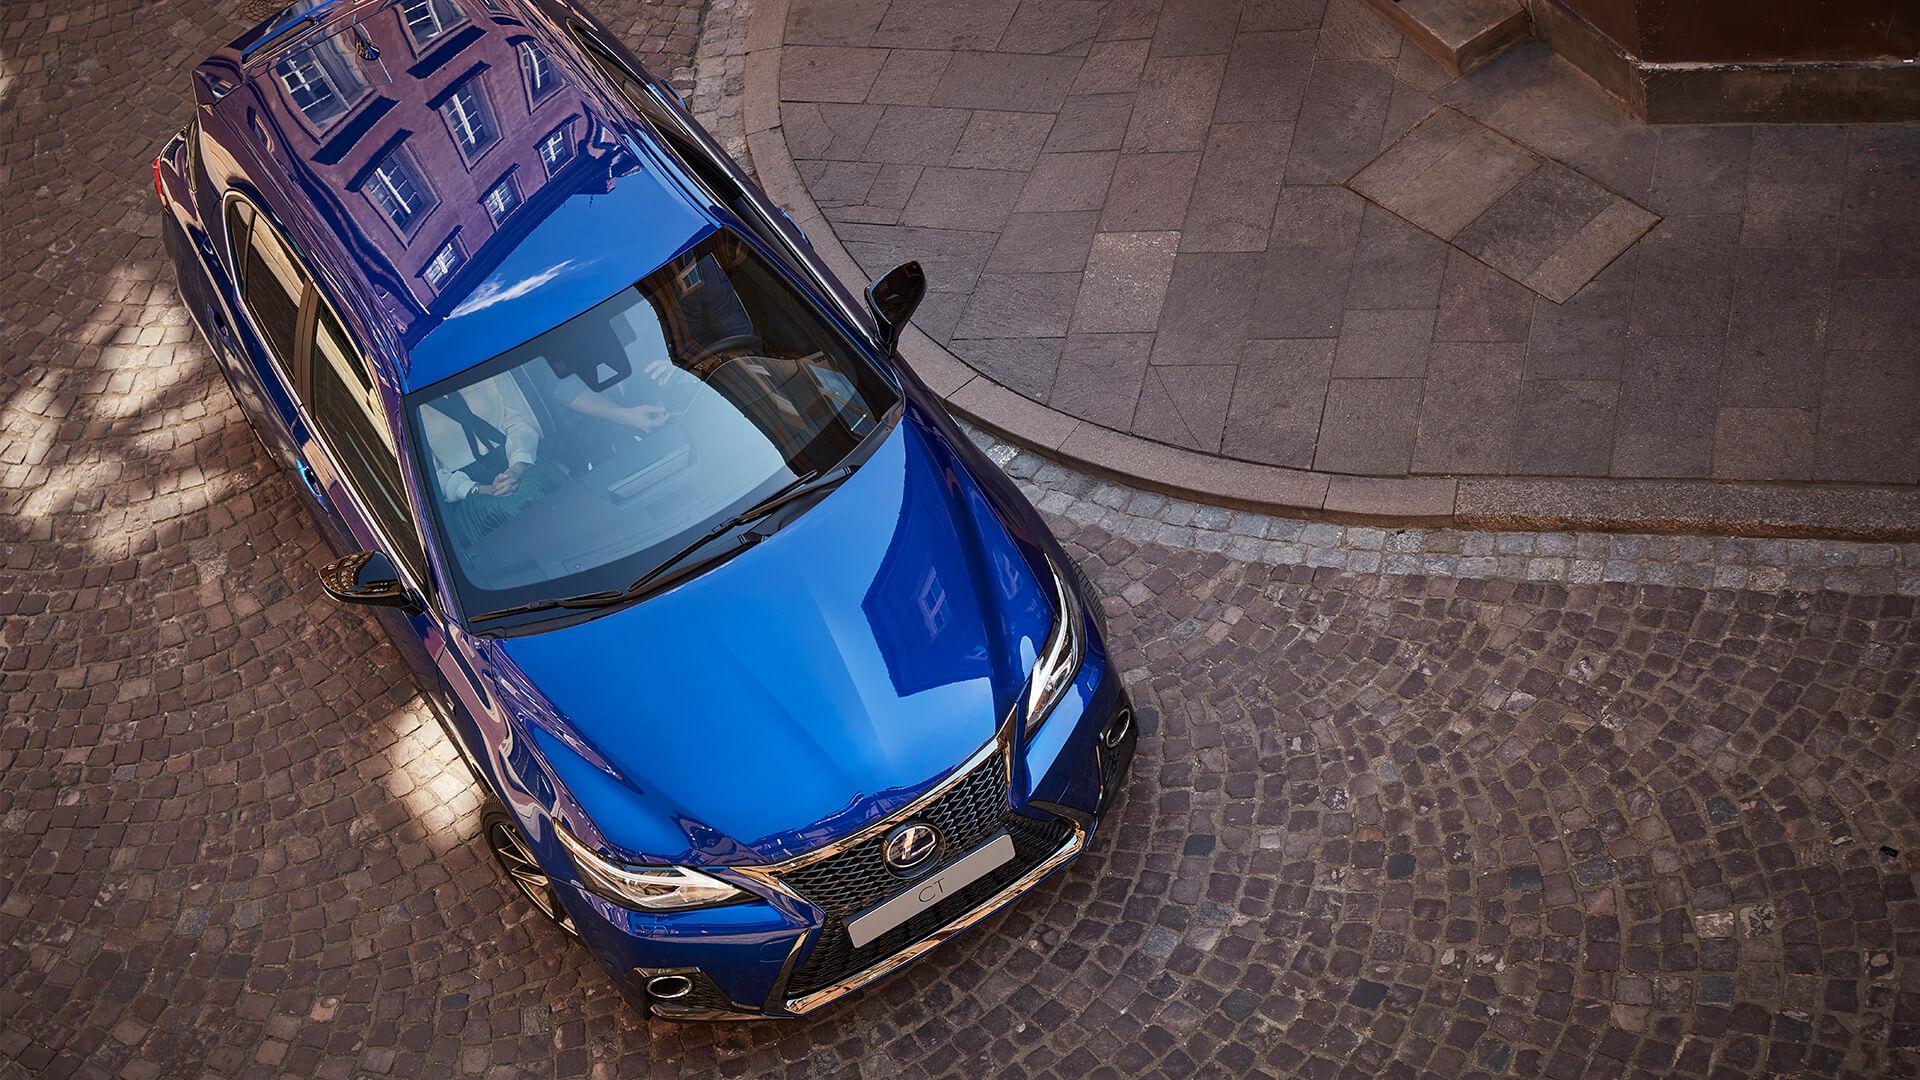 Bovenkant blauwe Lexus CT 200h